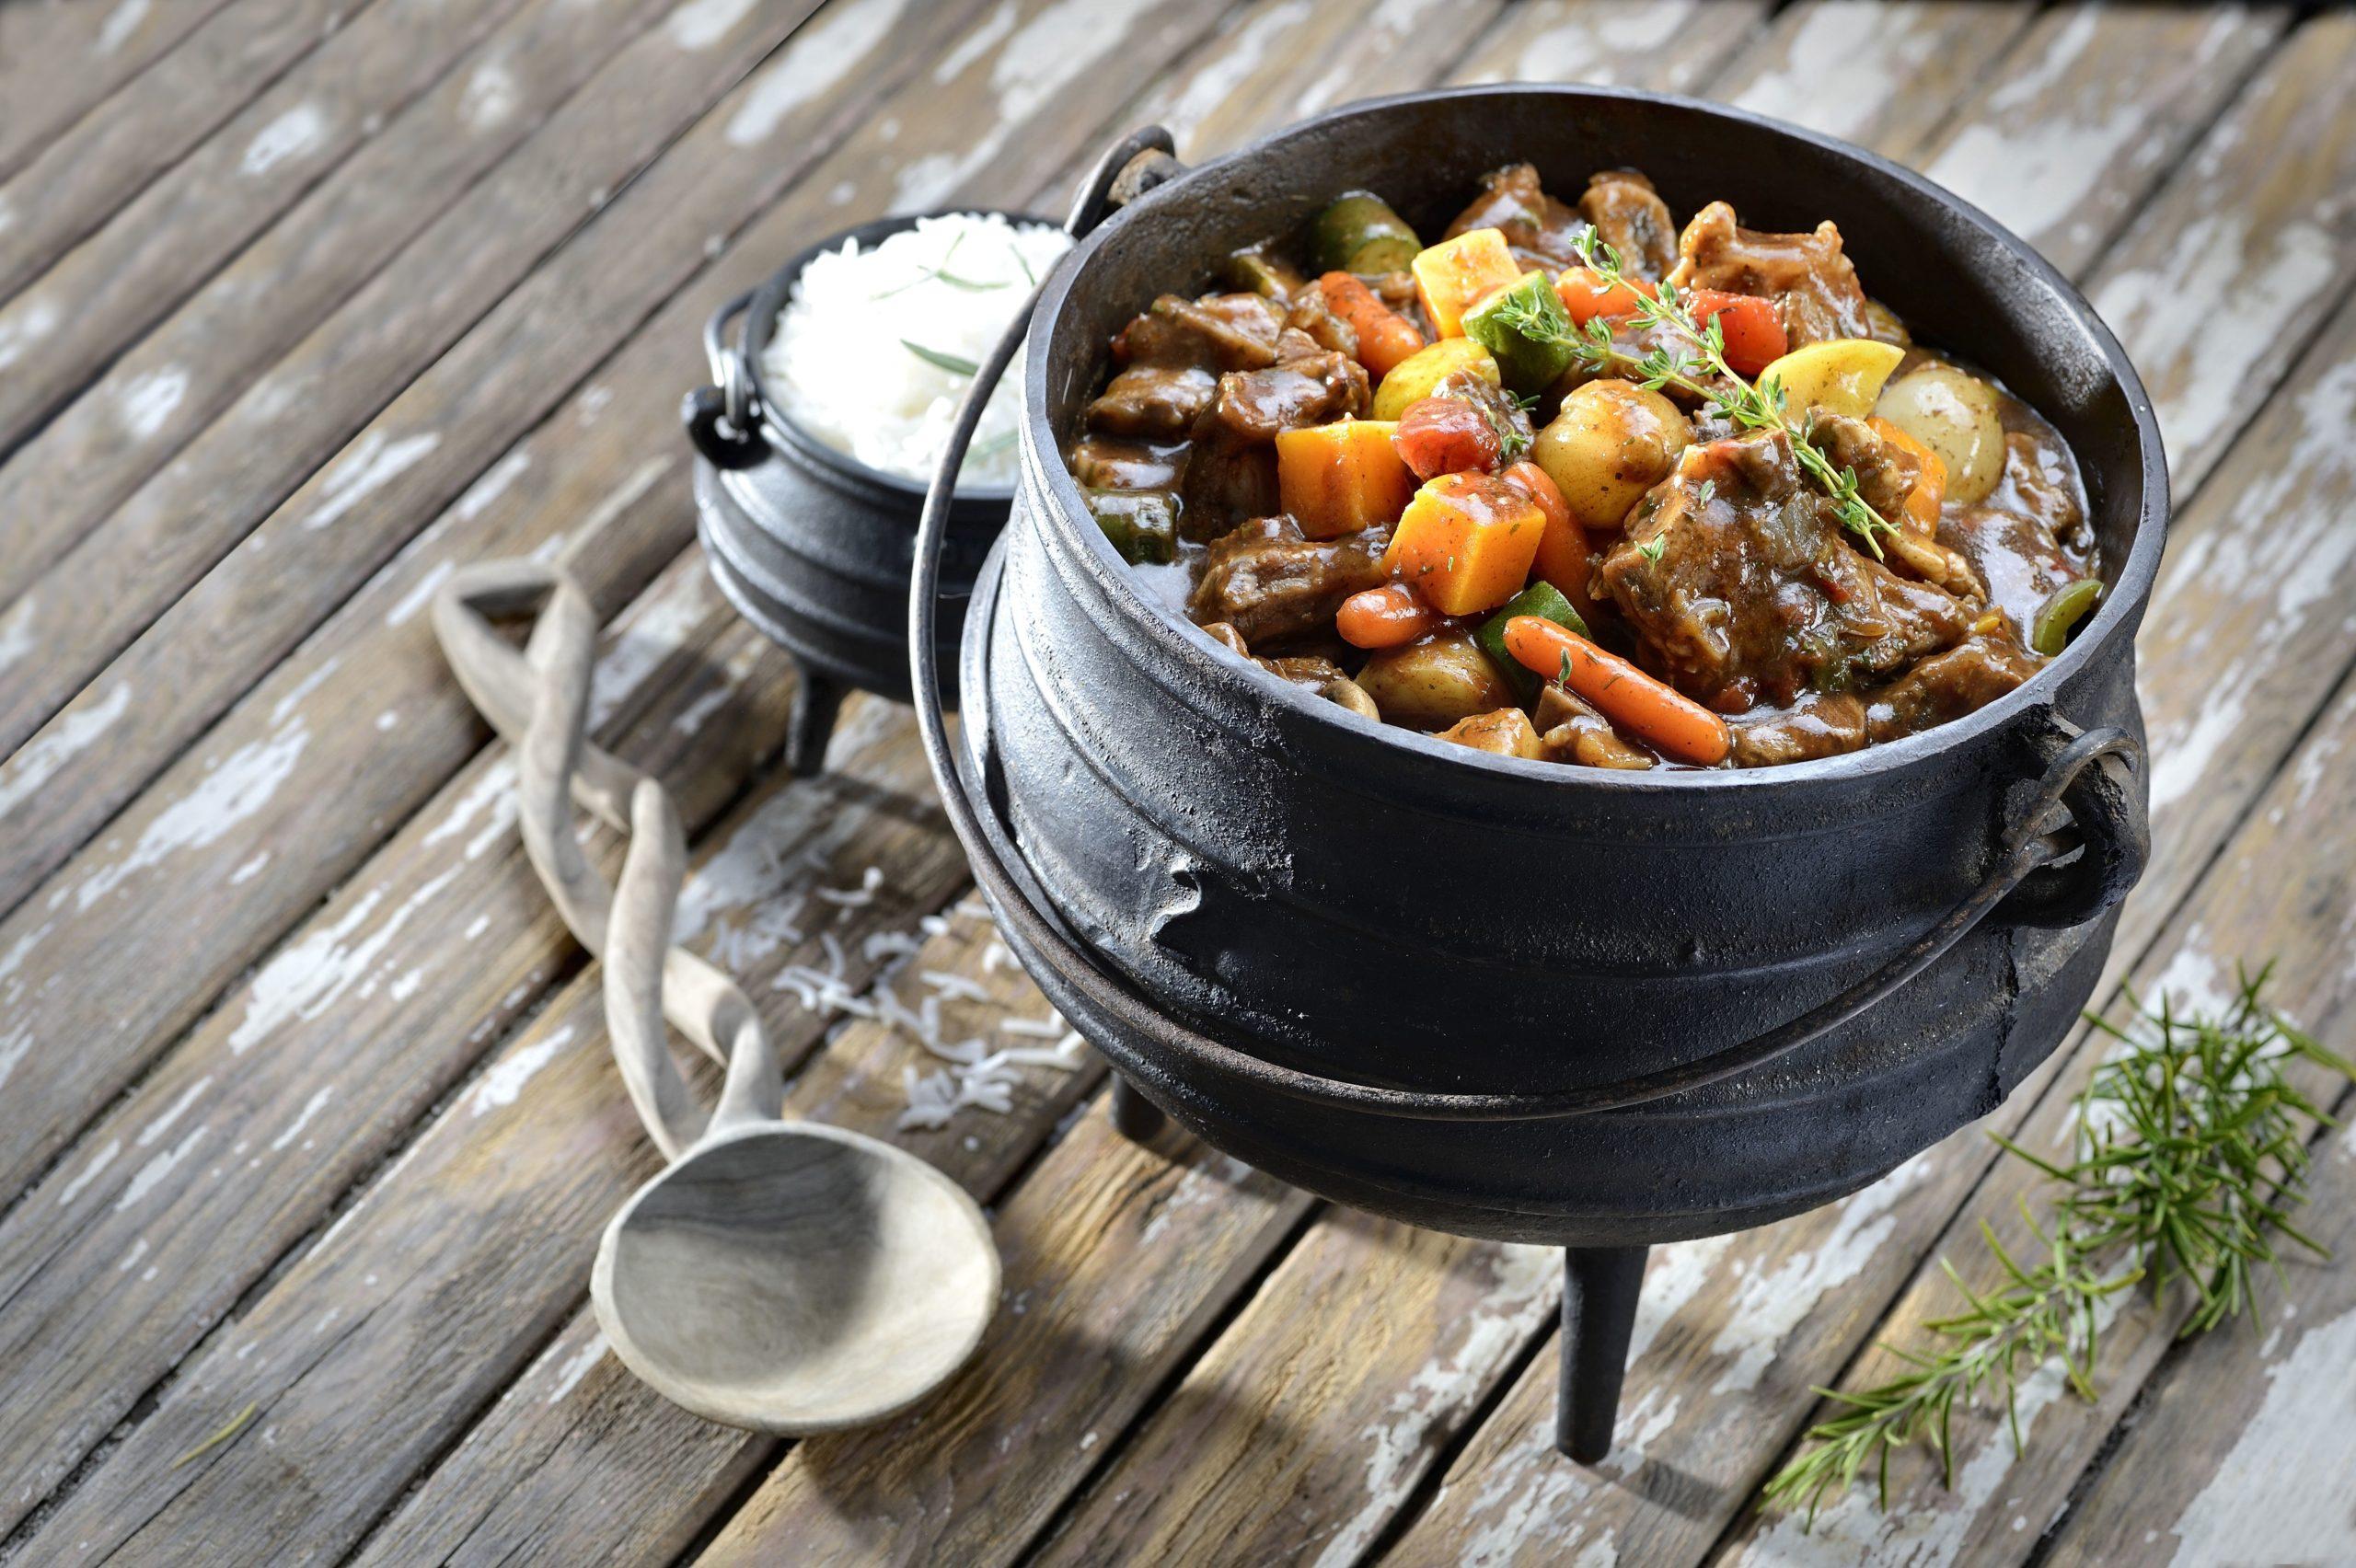 A Pot of Namibia's Traditional Potjiekos